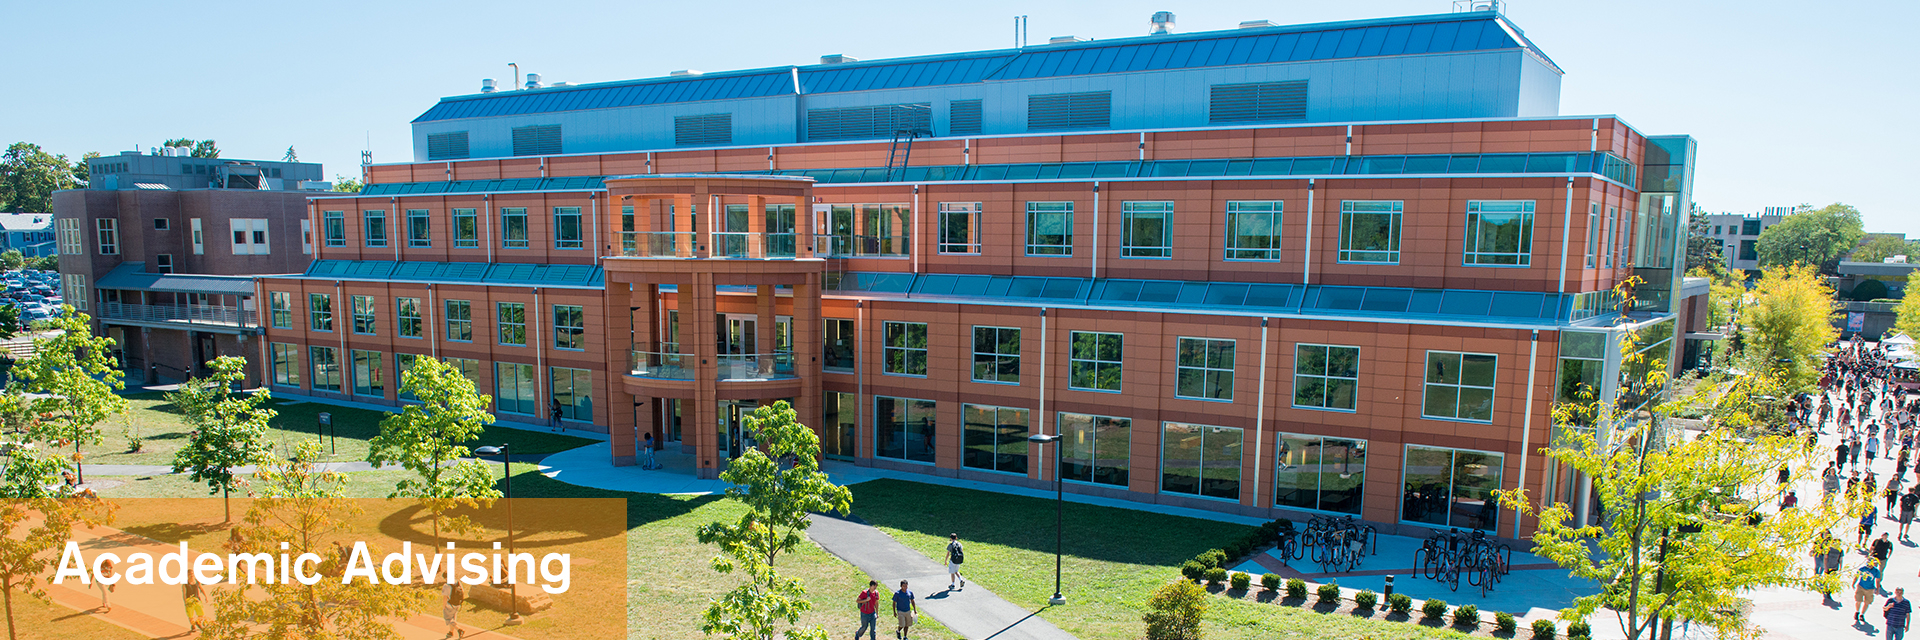 Suny New Paltz – Office Of Academic Advising Inside Suny New Paltz Calendar